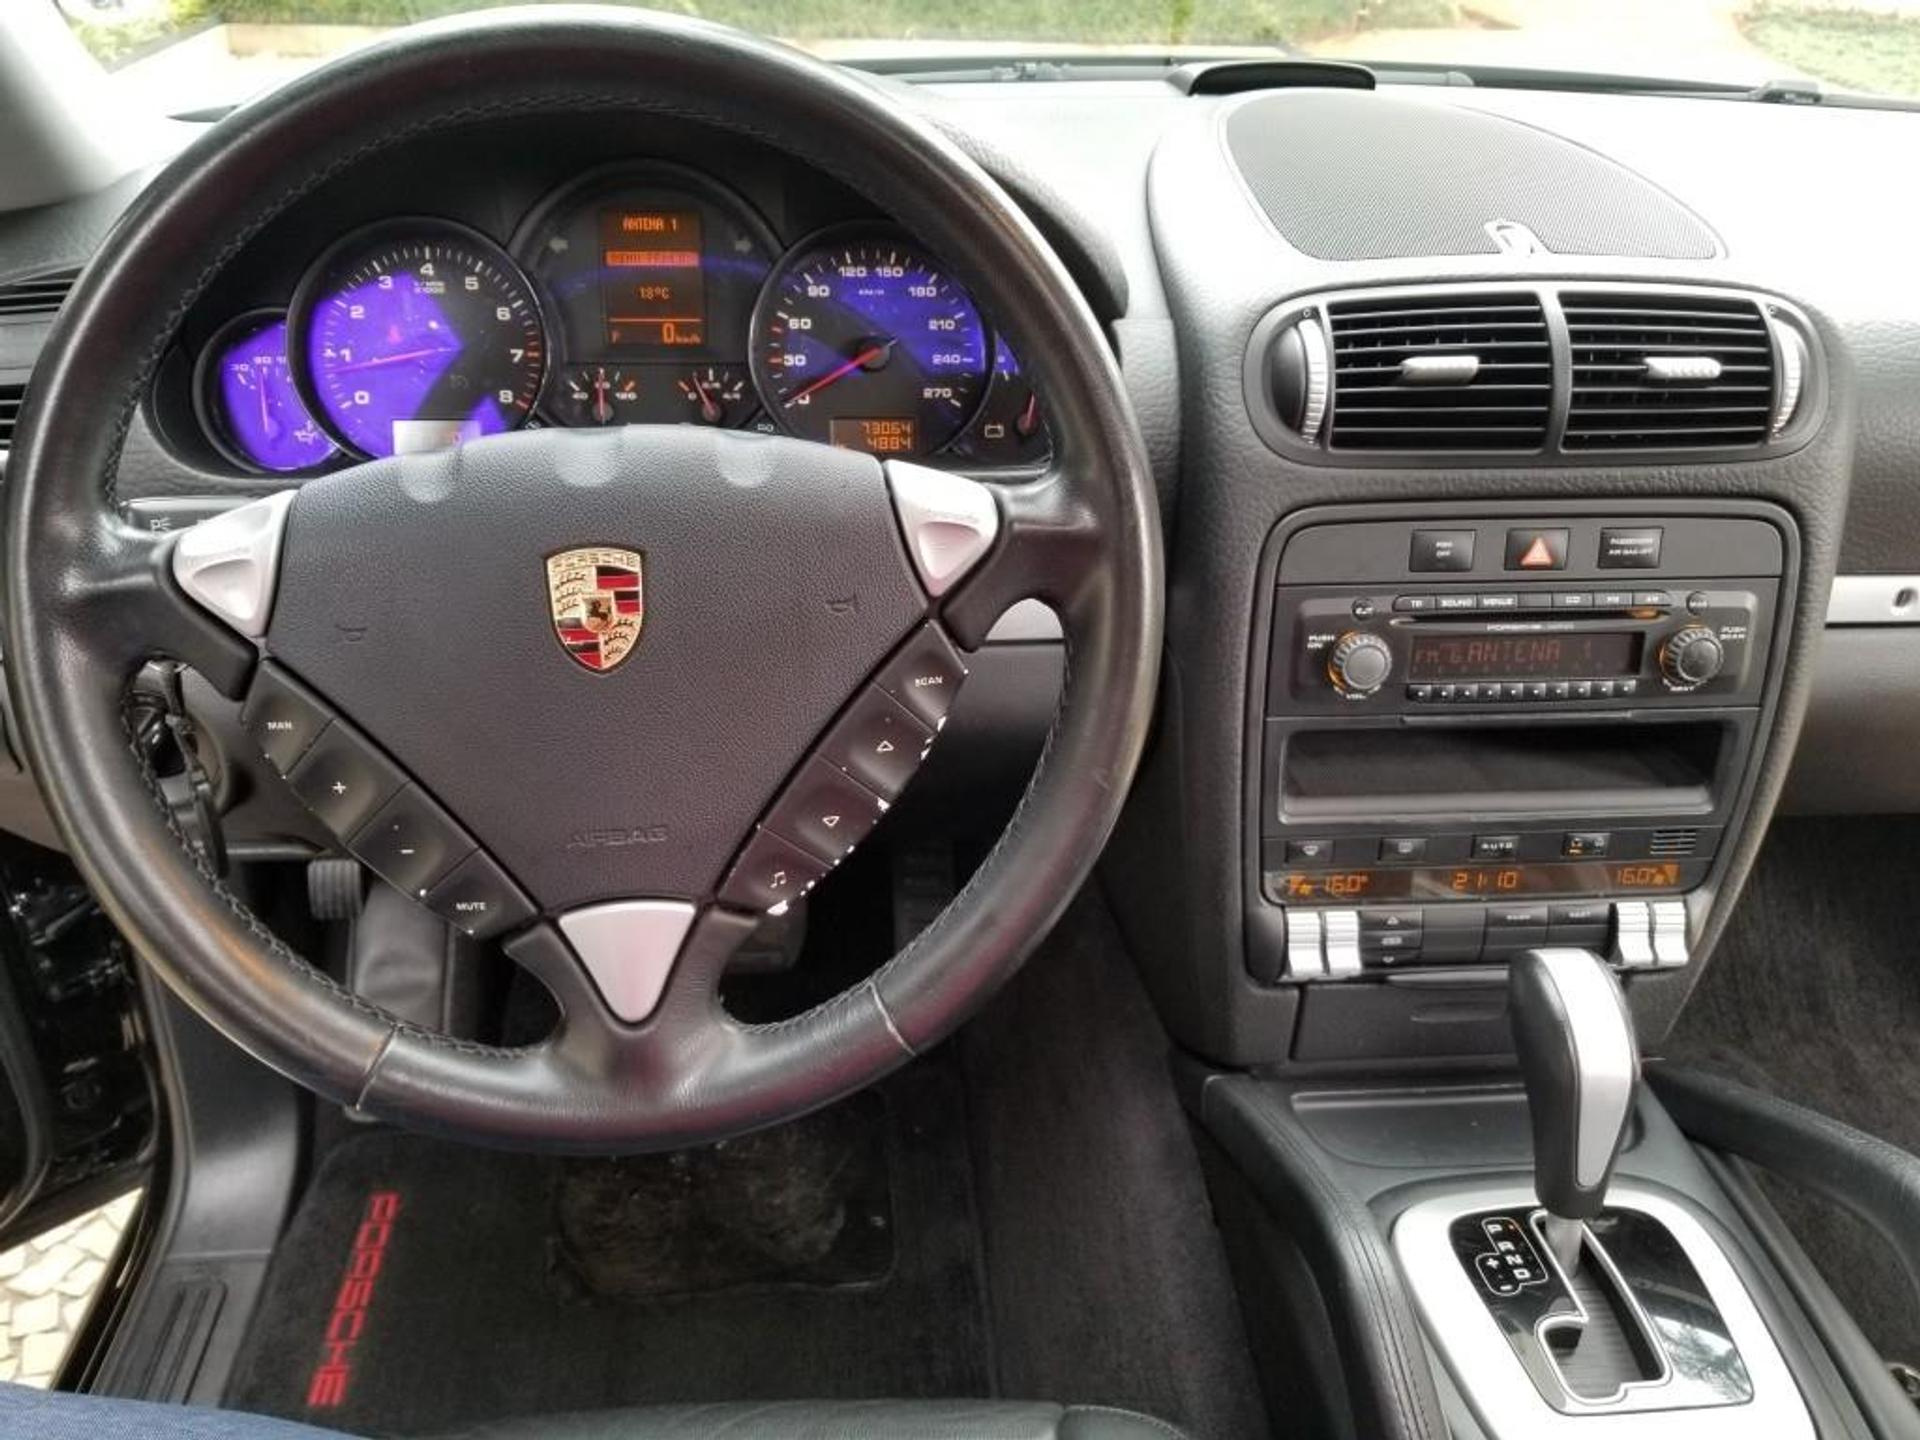 Porsche Cayenne 3.2 4x4 V6 24v Gasolina 4p Tiptronic Wmimagem18173252594